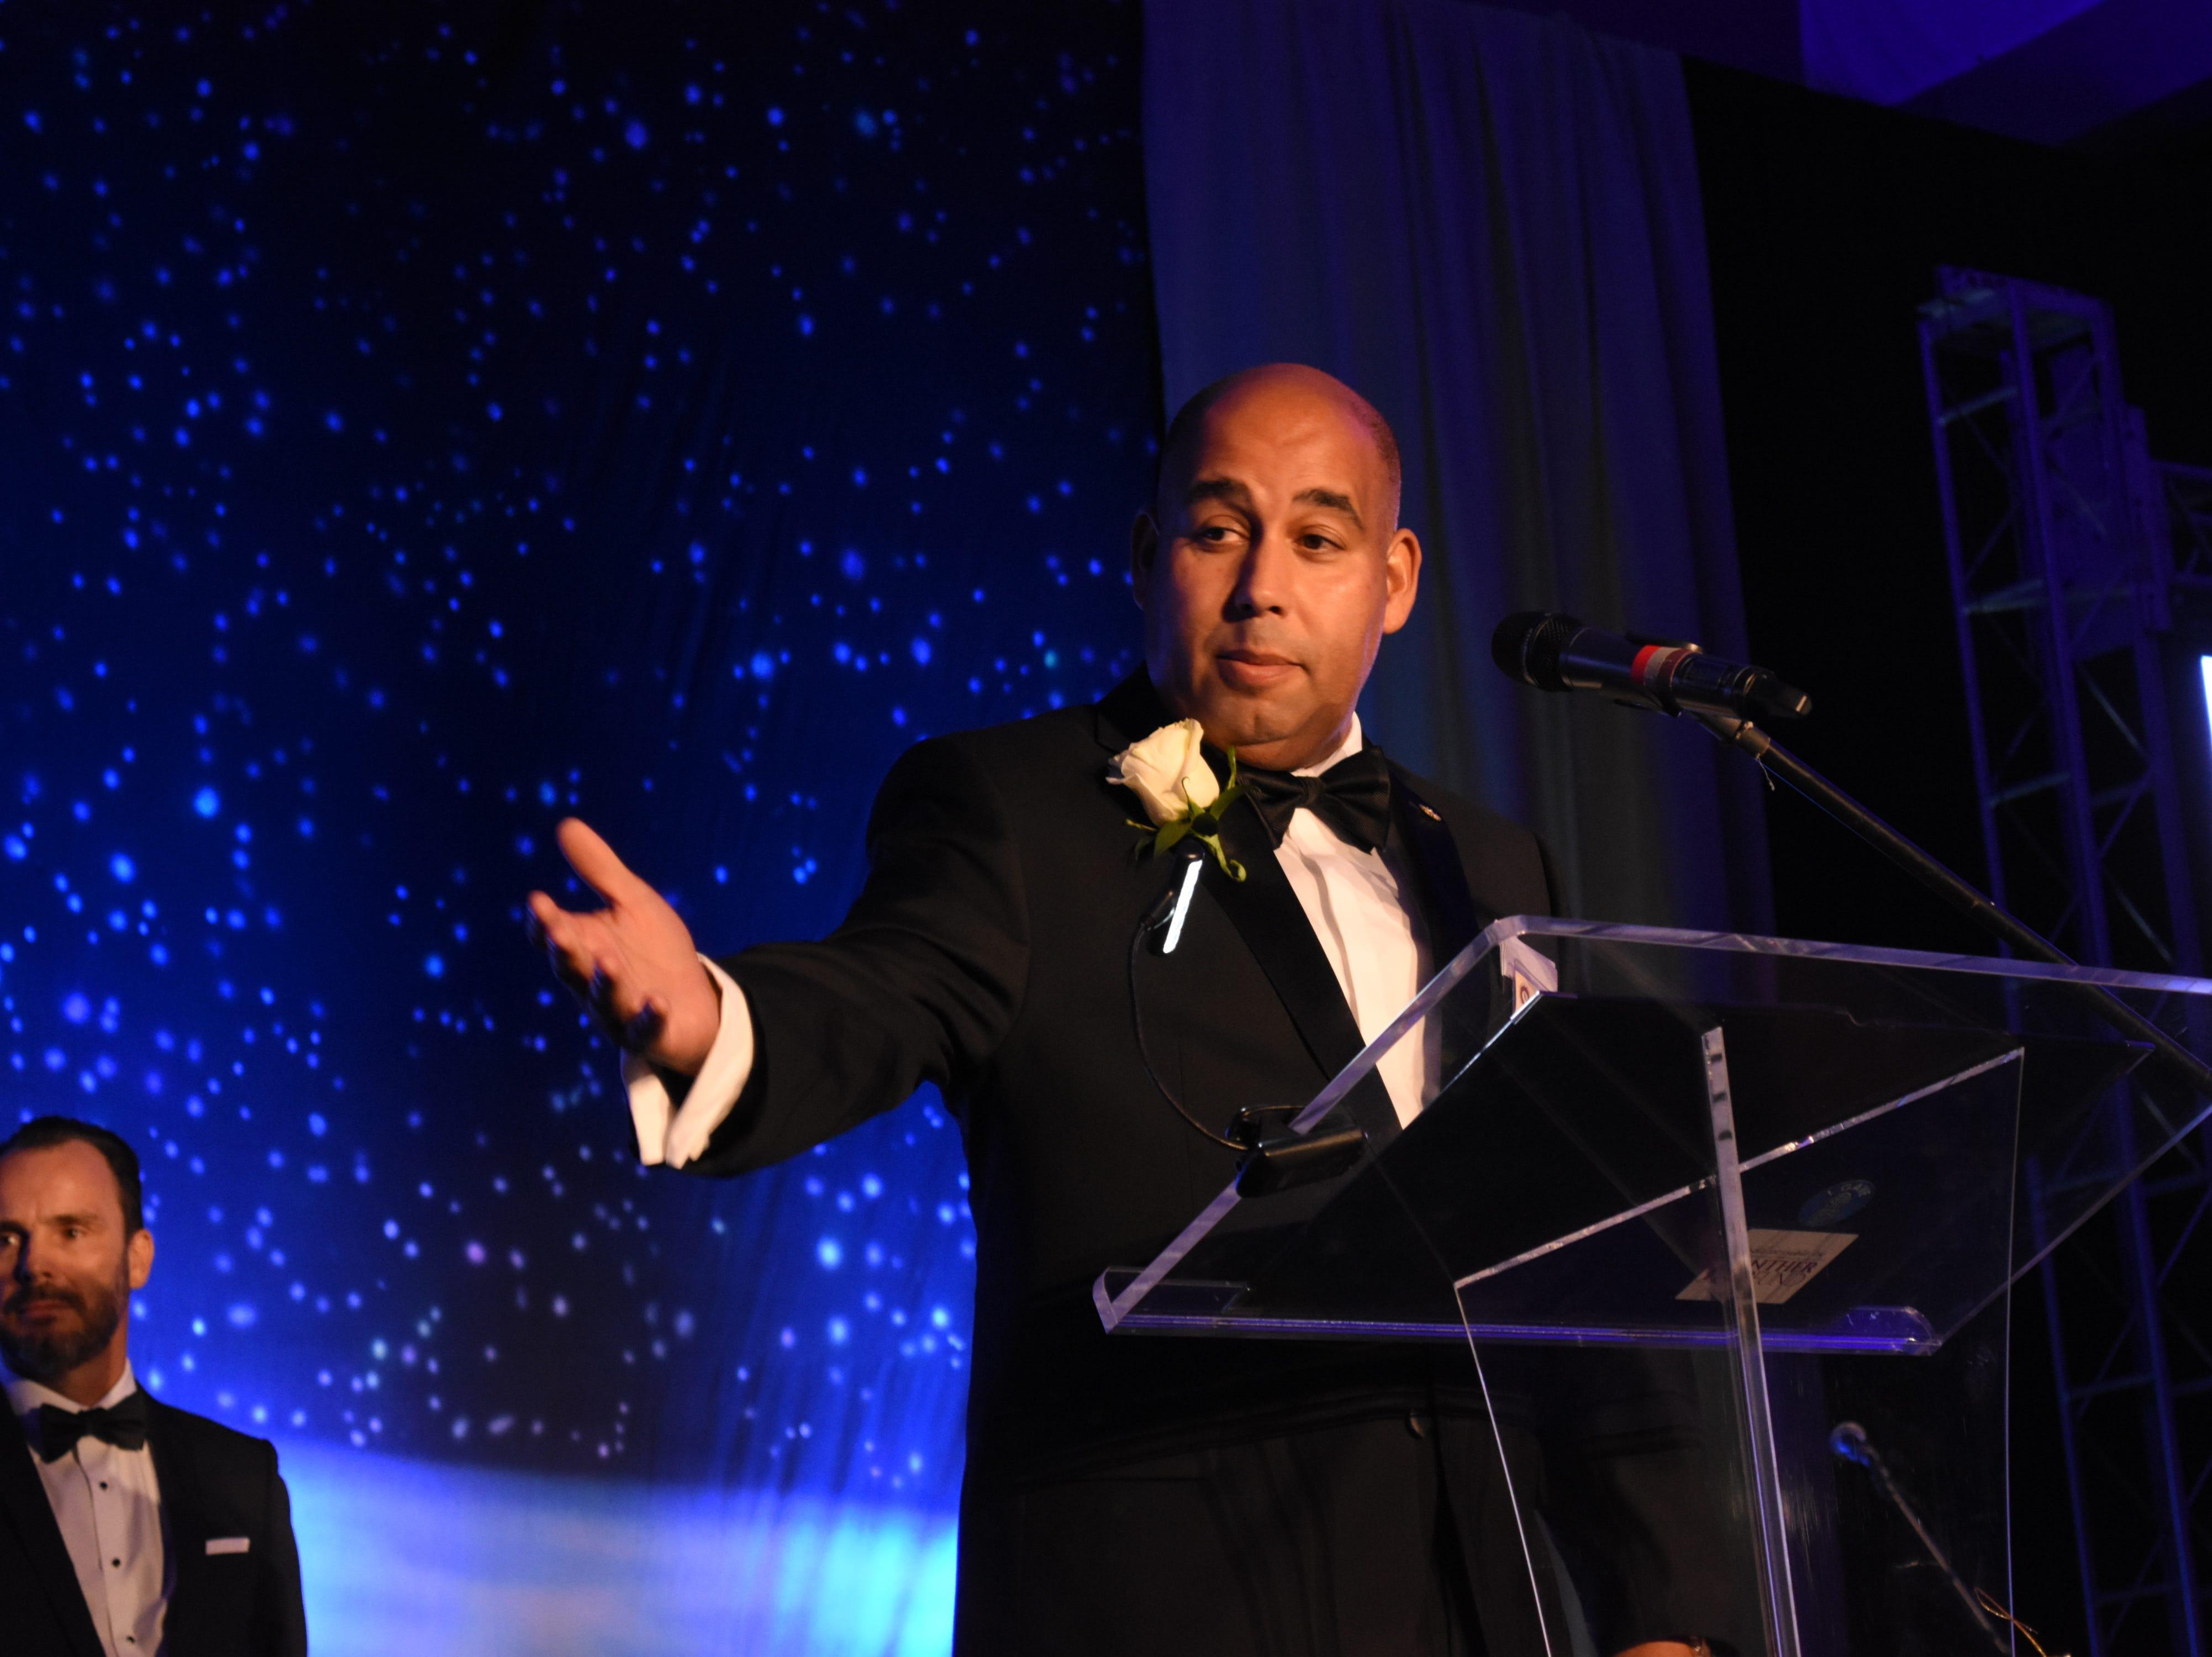 Skurla Award recipient Miguel Estrenera at Florida Tech's 60th Anniversary Homecoming Gala Oct. 13, 2018, at the Clemente Center.